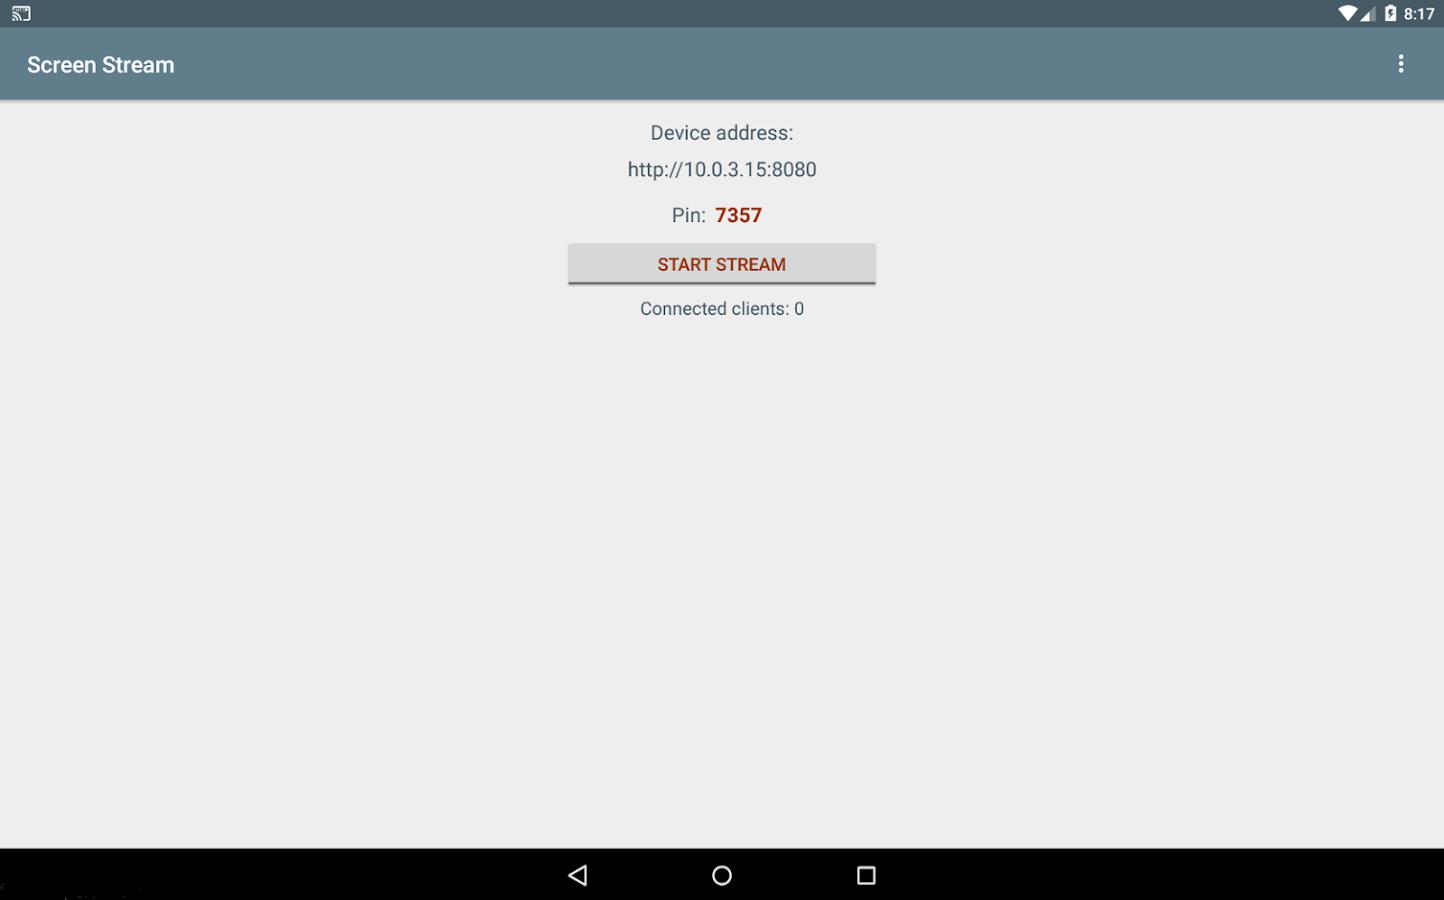 Screen Stream over HTTP